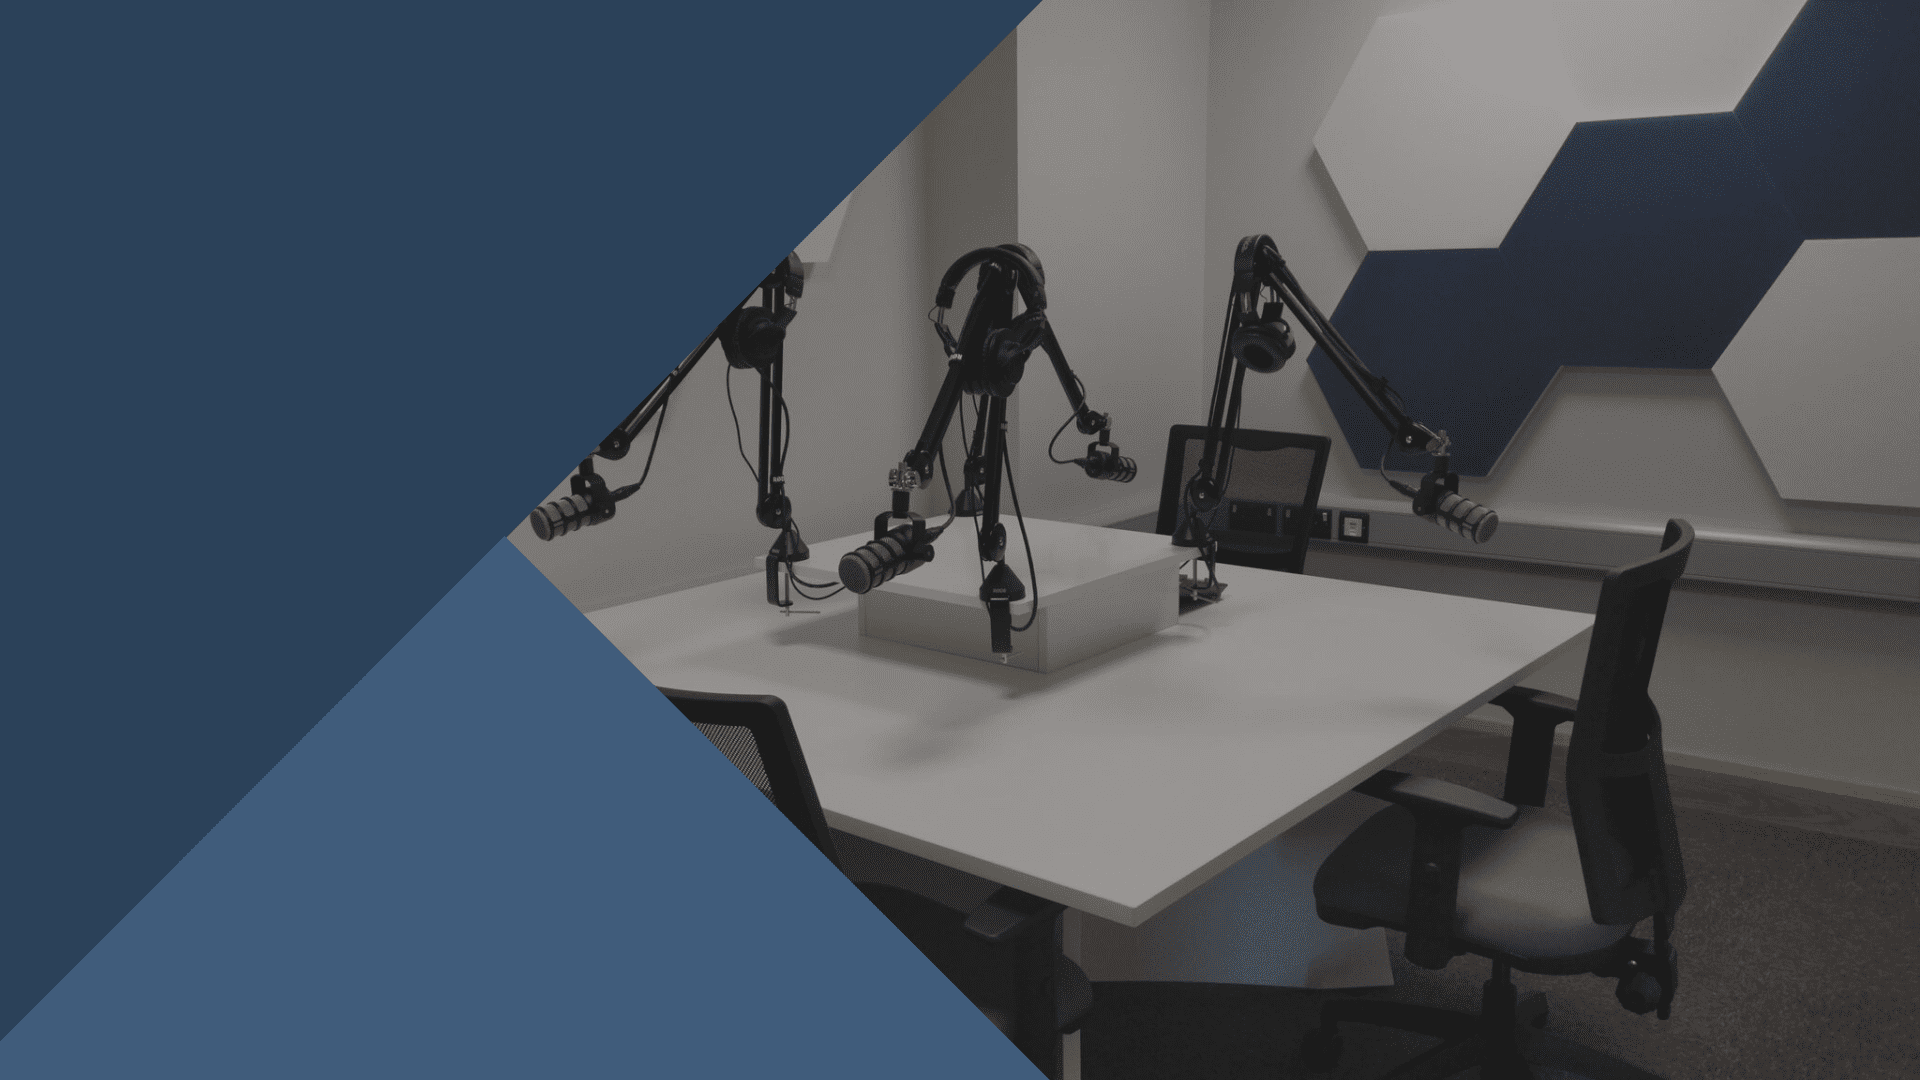 Granite Podcast Studio Has Launched